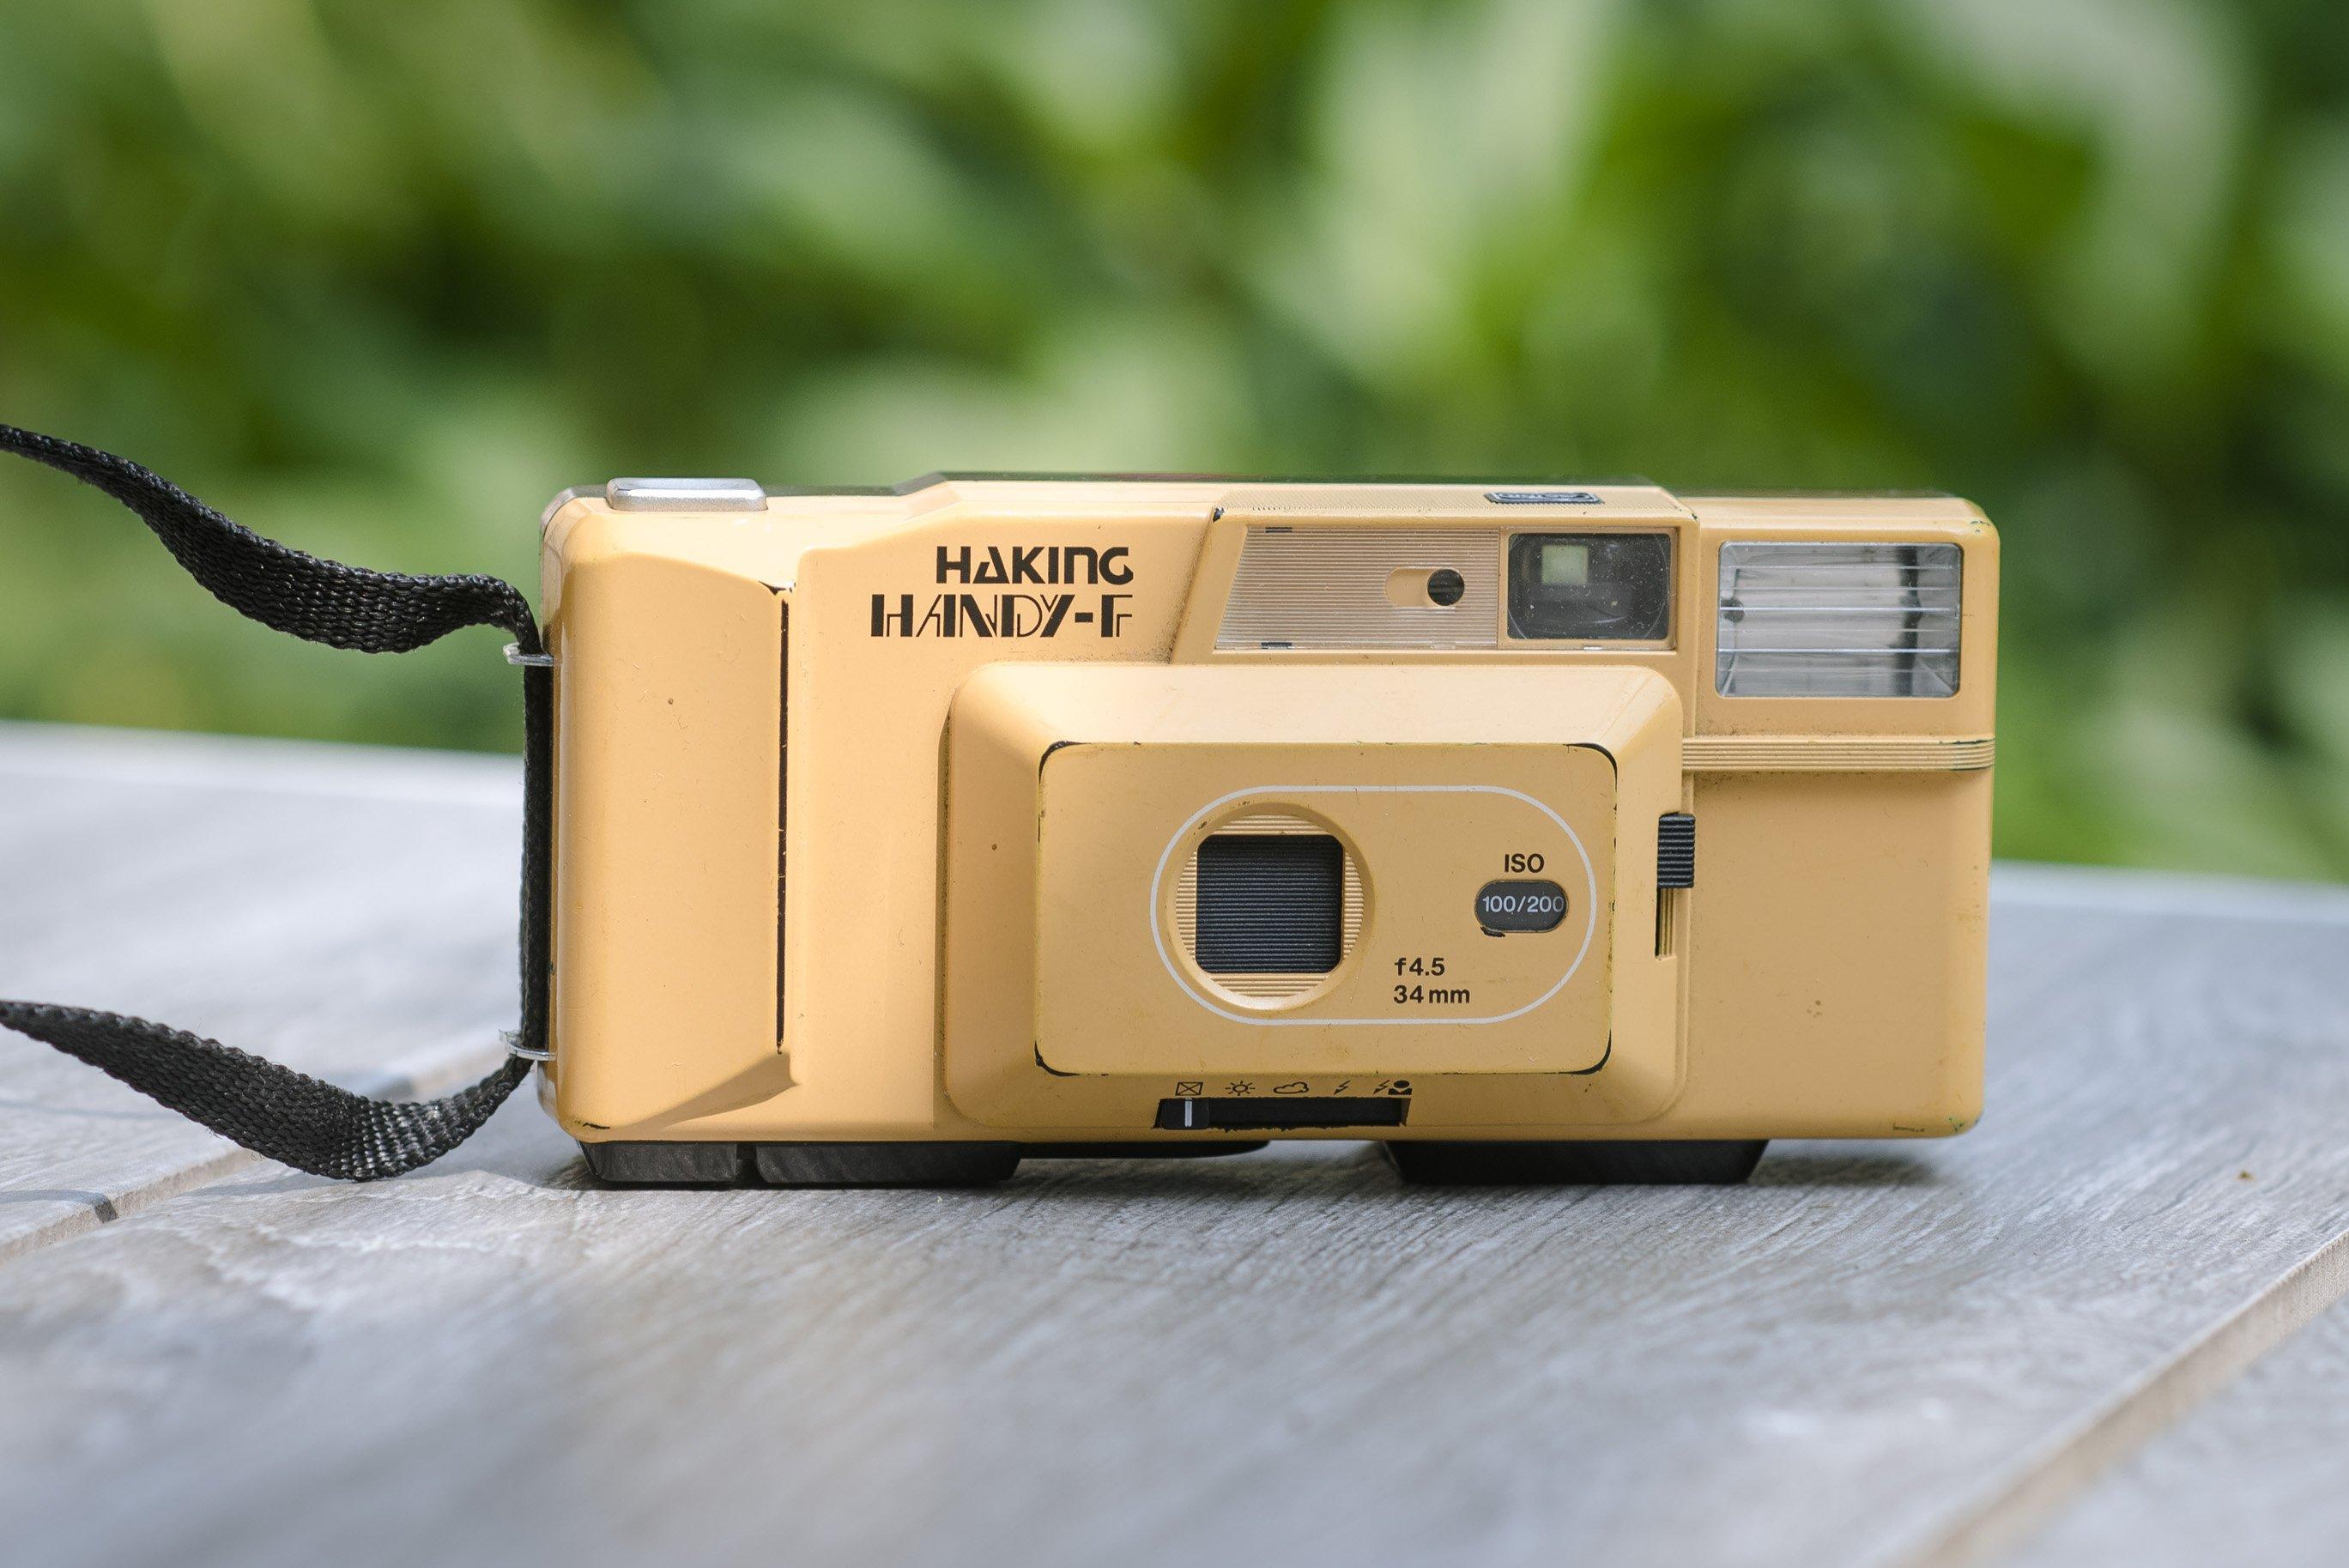 macchina analogica vintage gialla